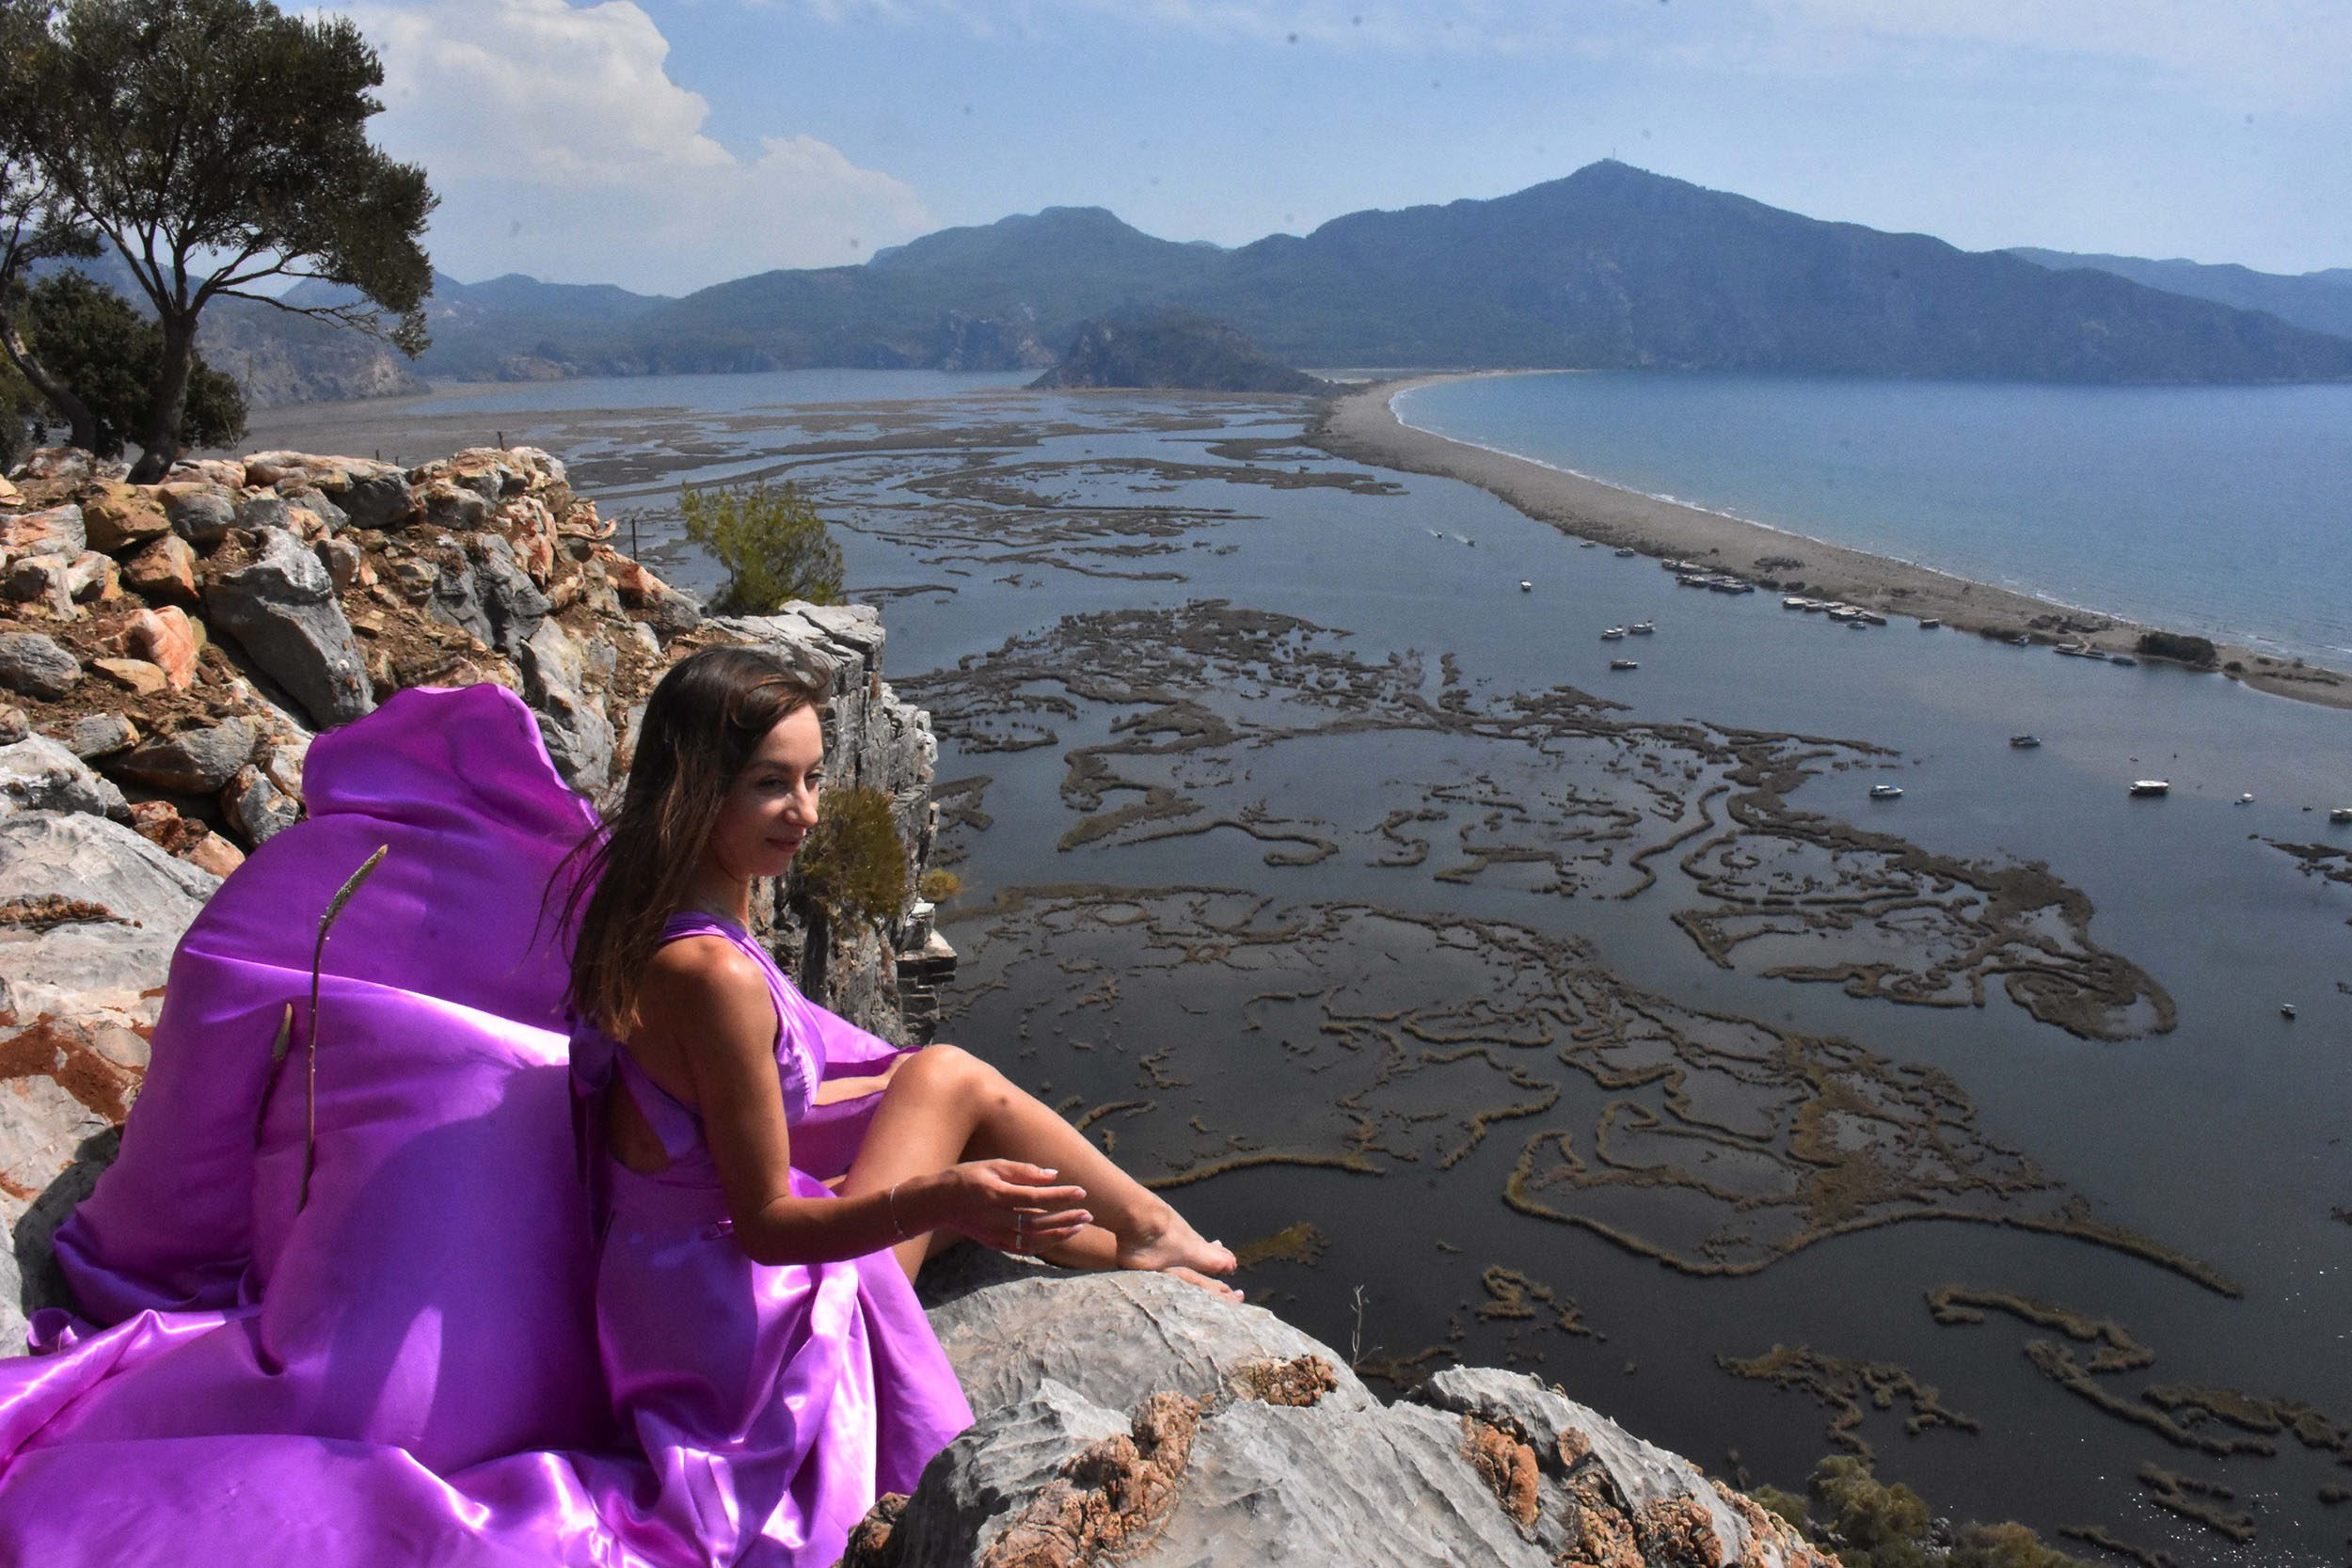 Russian influencers amazed by beauty of Turkey's Mugla